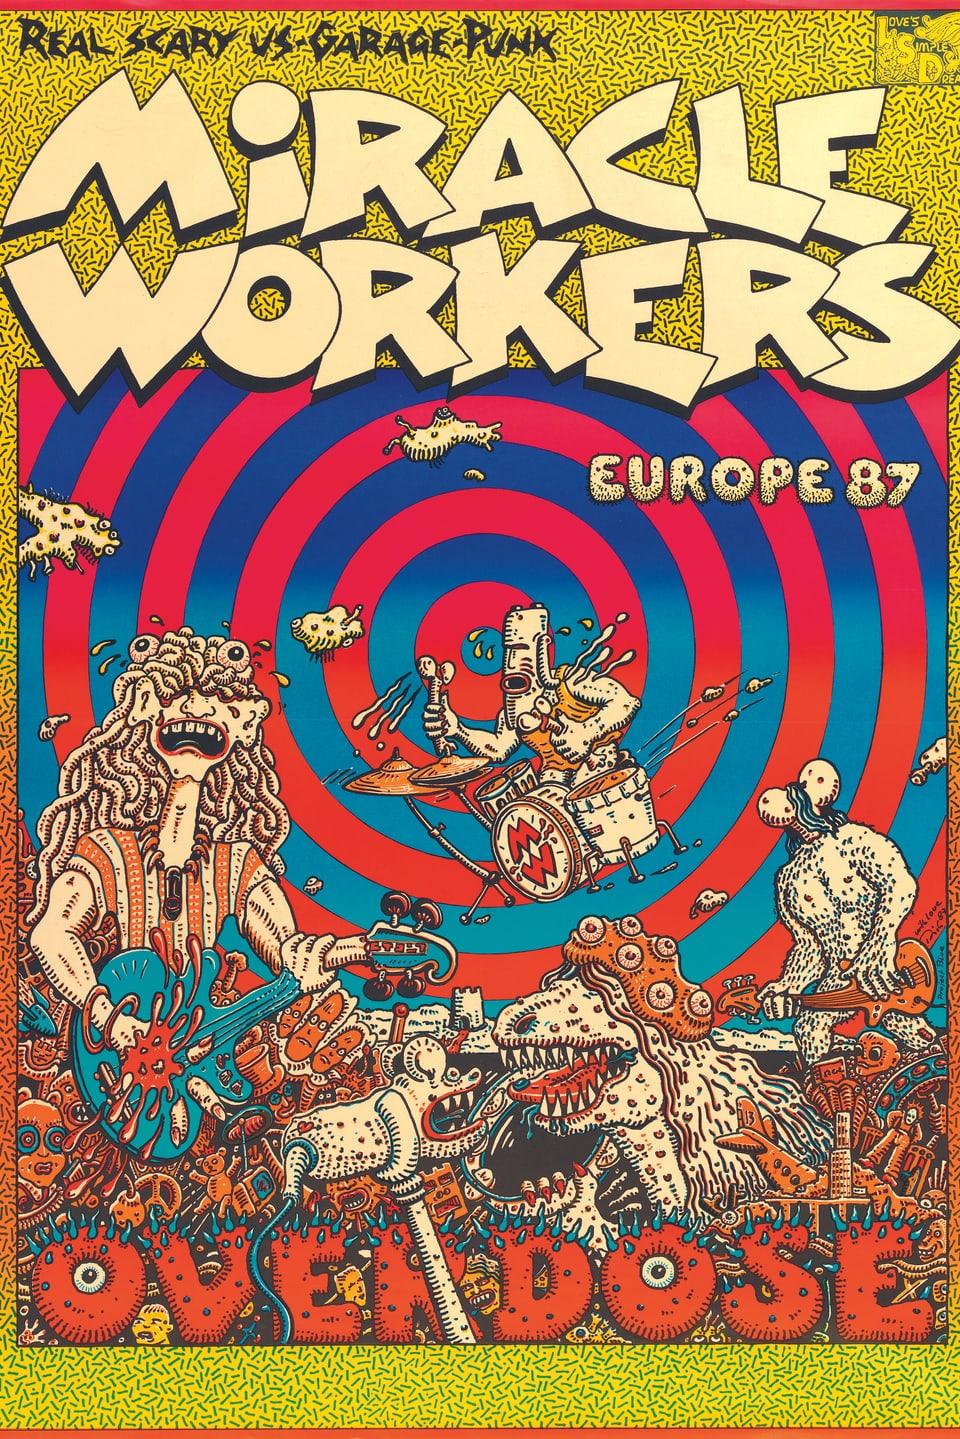 Konzertplakat der Band Miracle Workers